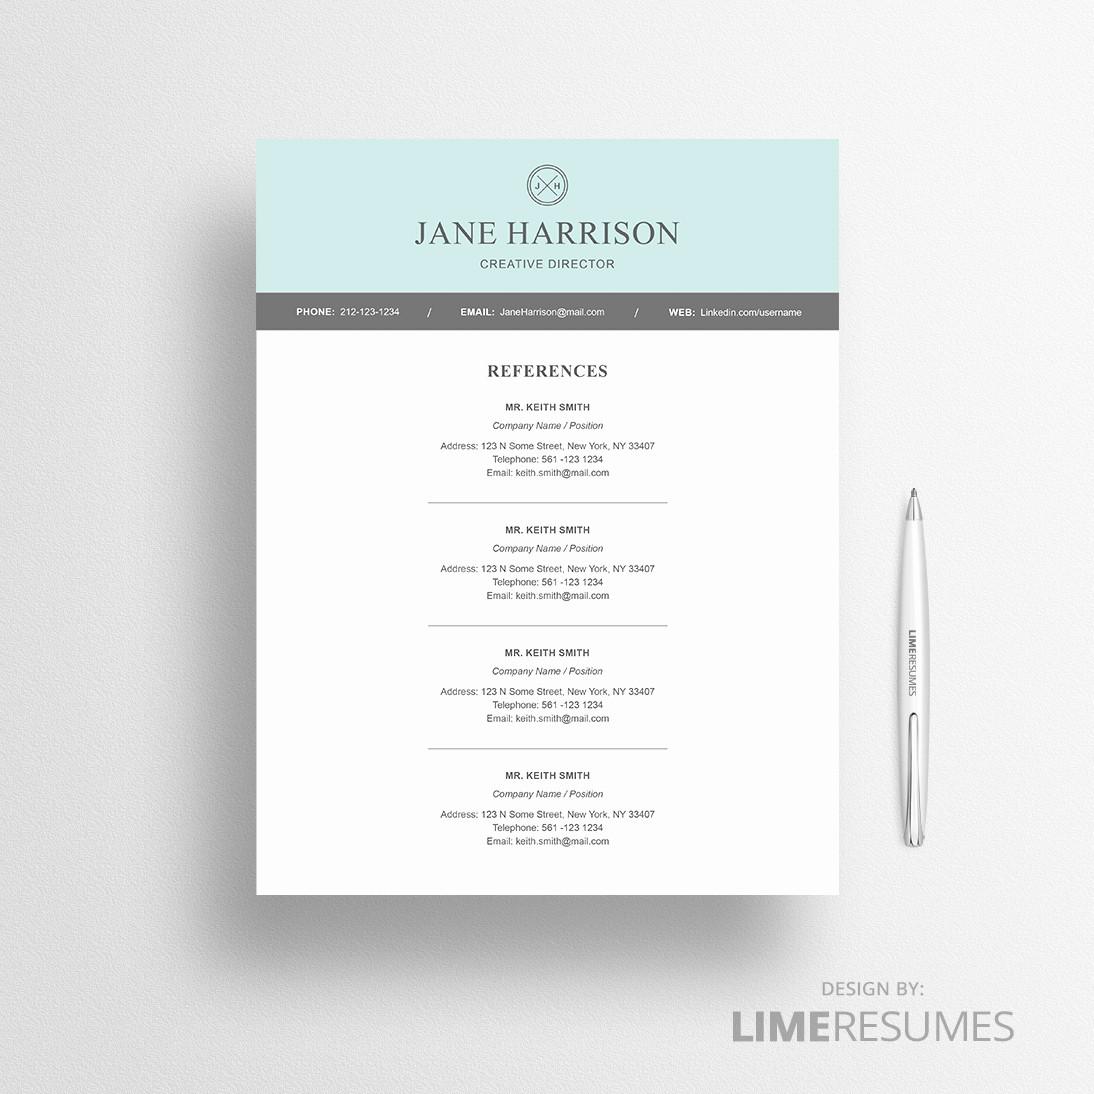 Modern Resume Template Free Word Beautiful Modern Resume Template for Microsoft Word Limeresumes